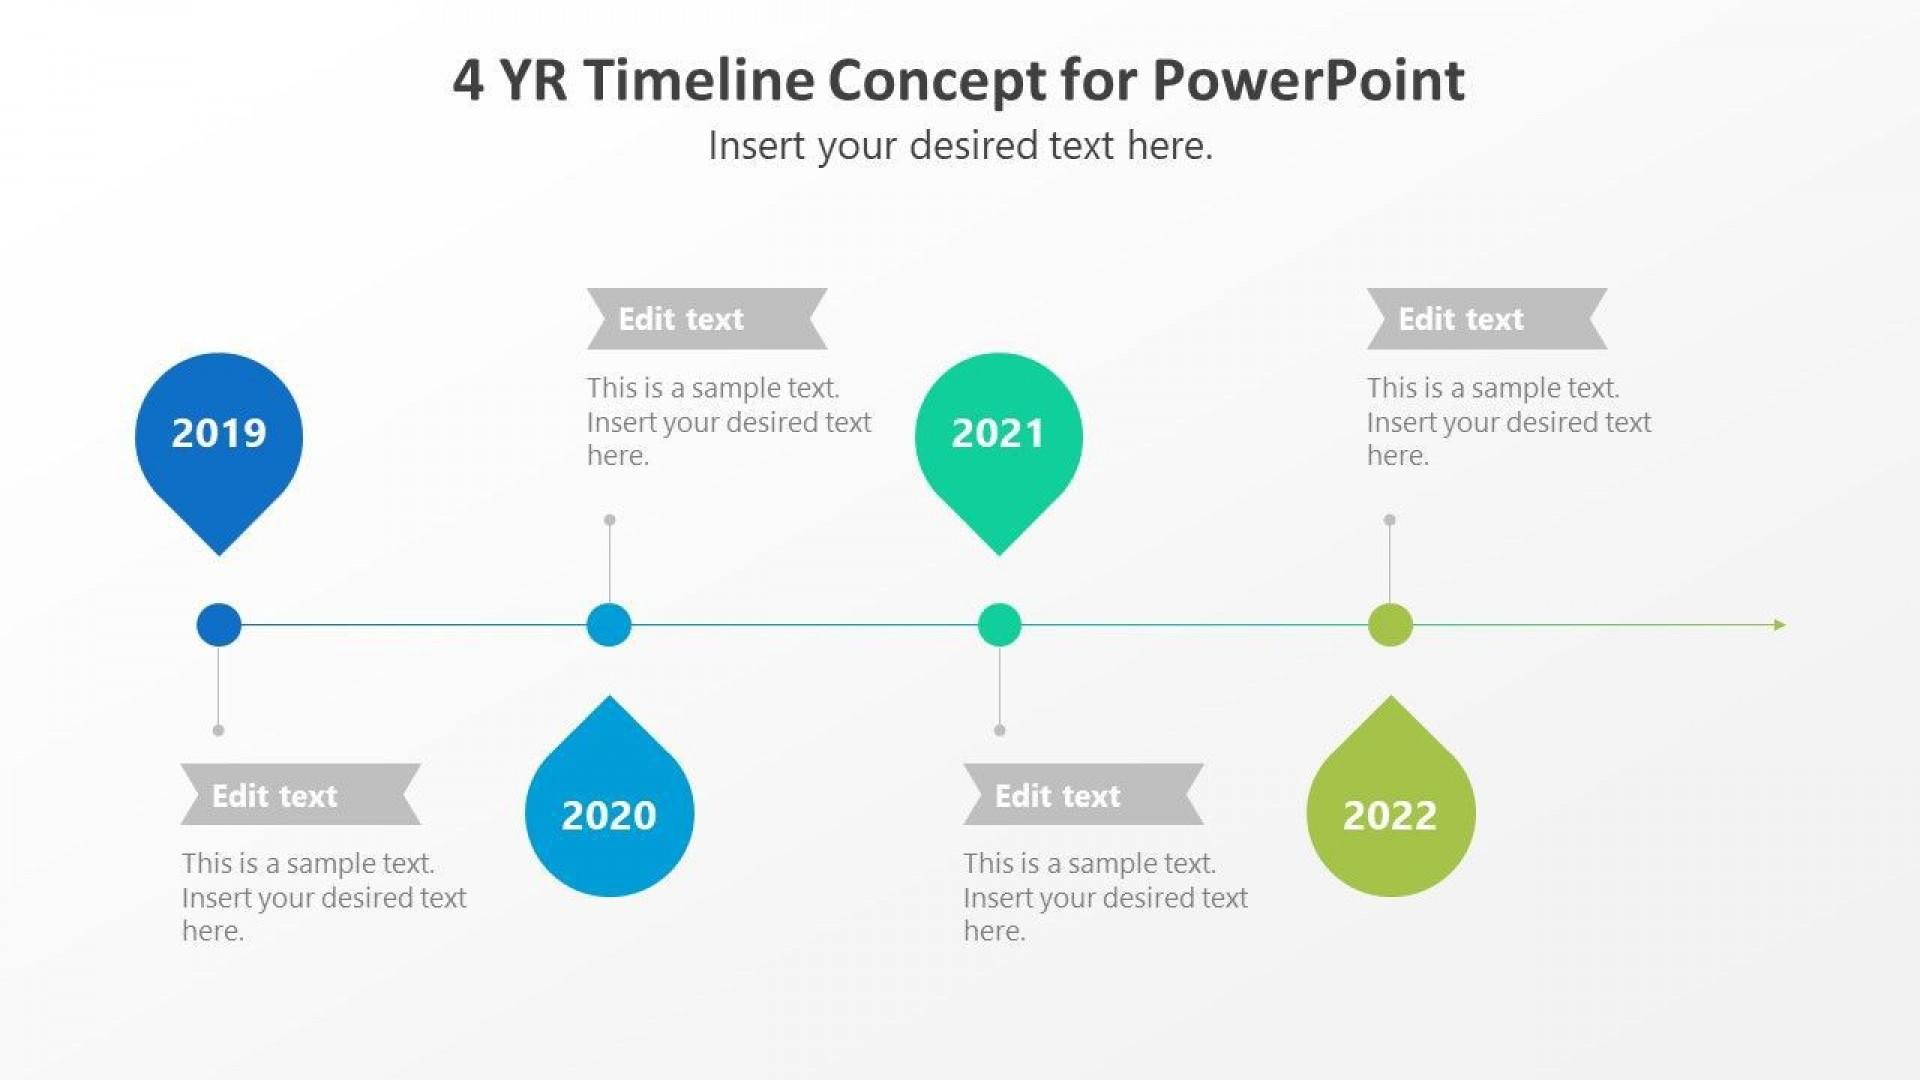 006 Fascinating Timeline Presentation Template Free Download High Definition 1920